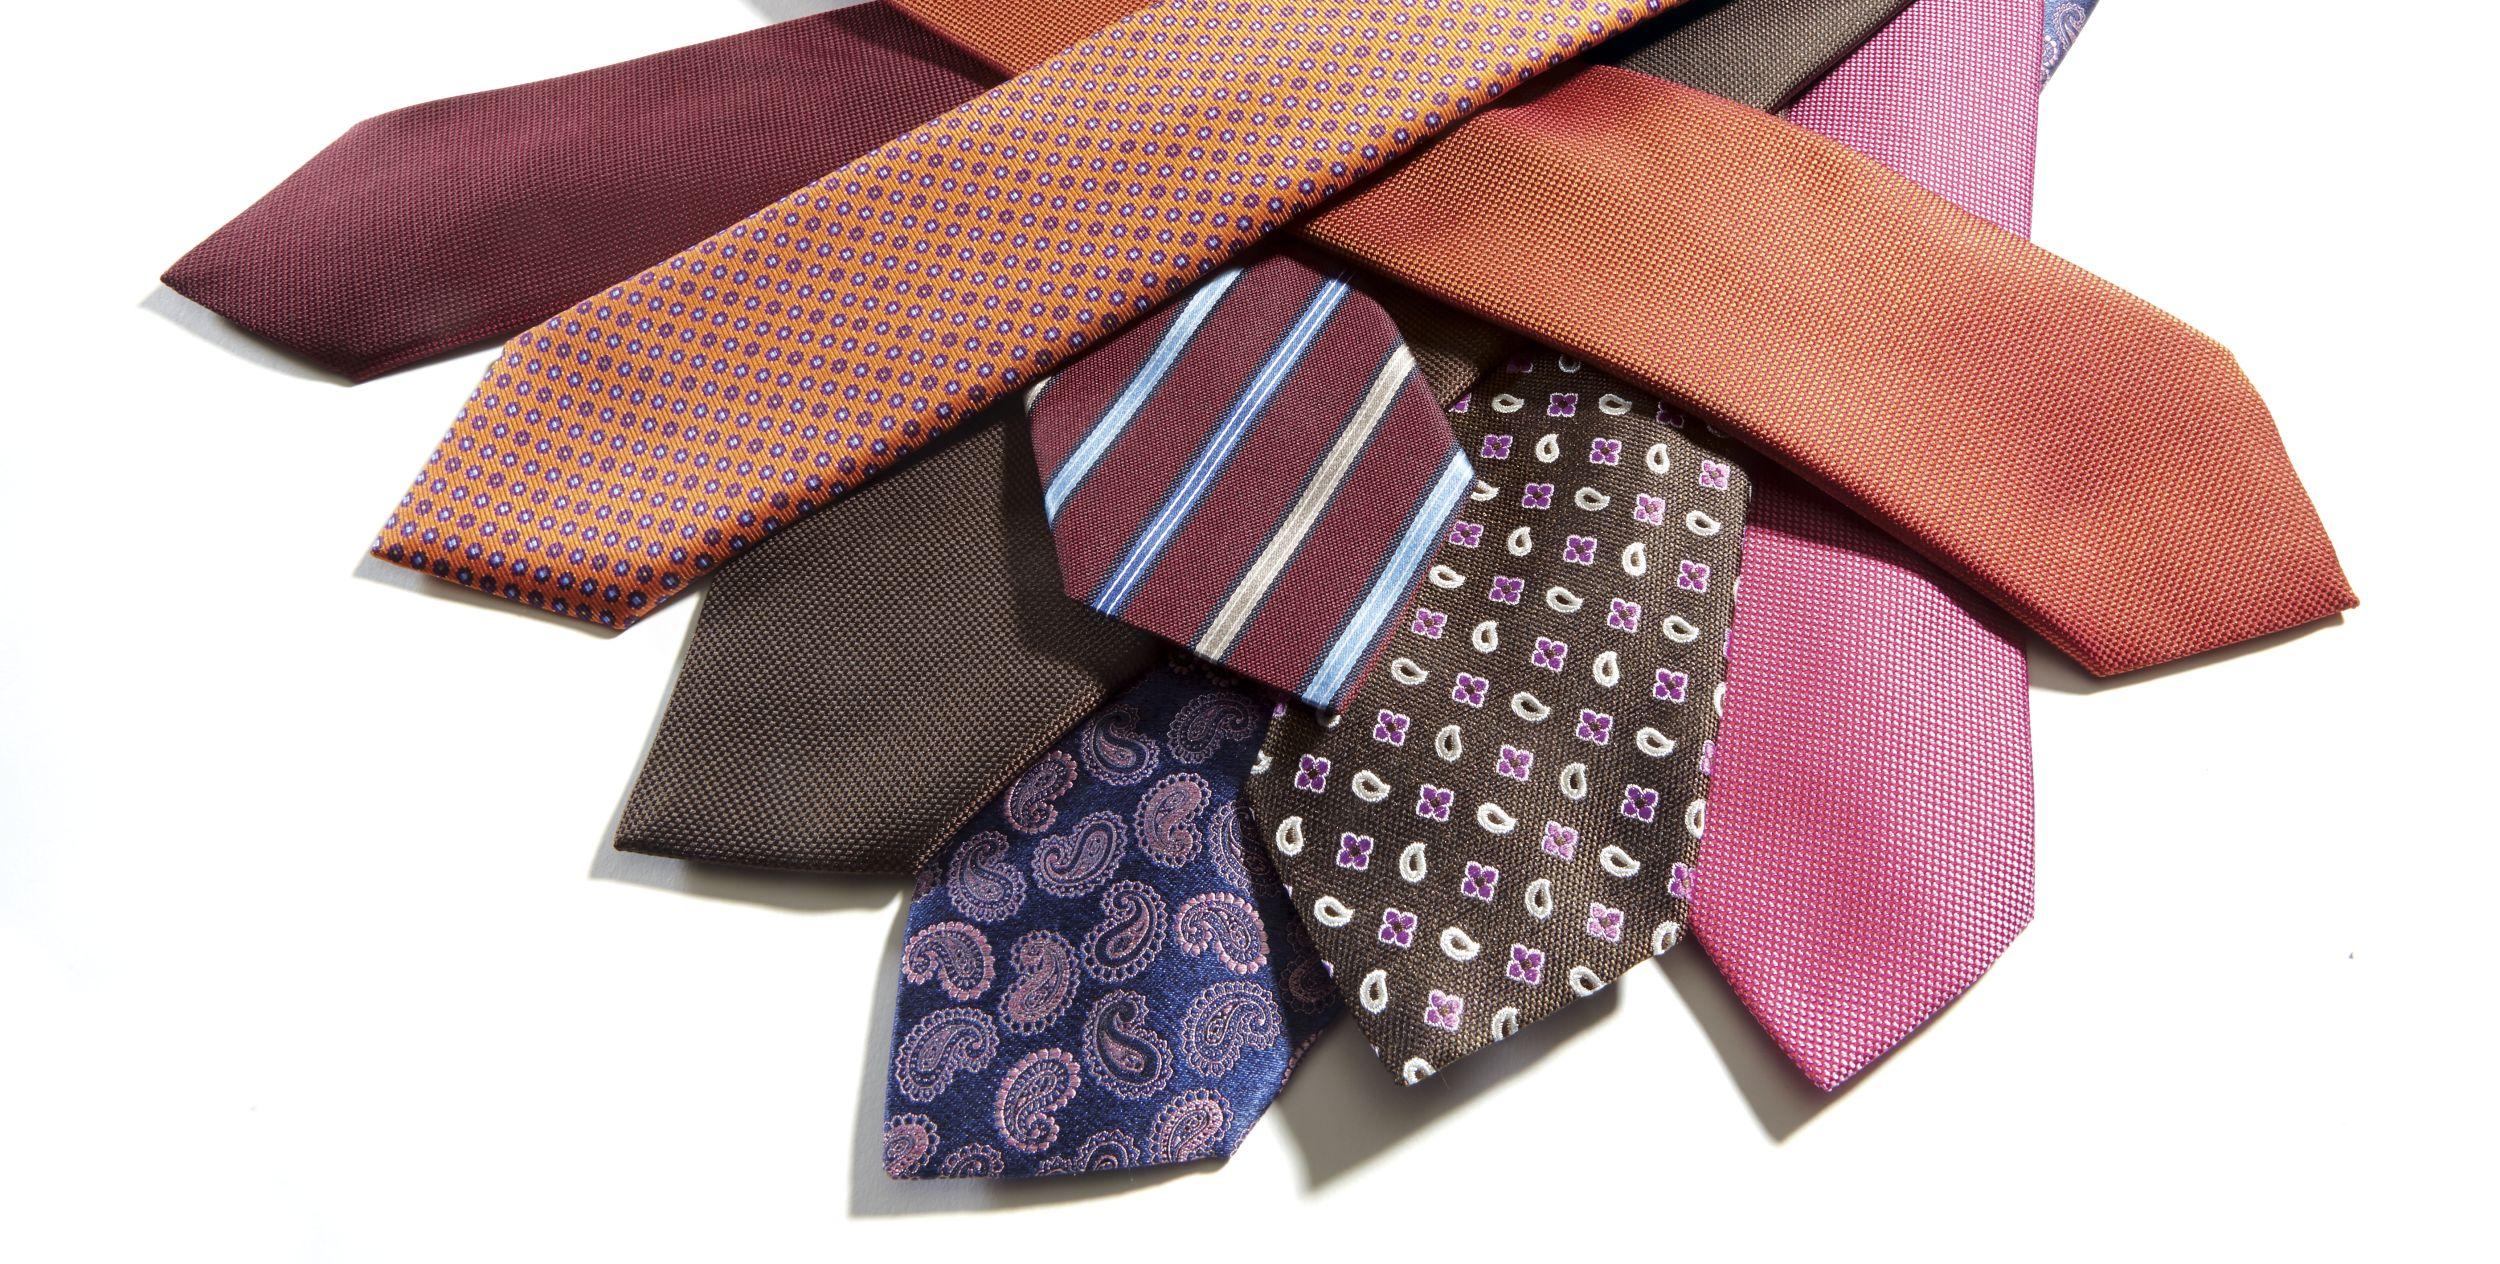 Tie Spread_Wide Angle15 - Copy.jpg